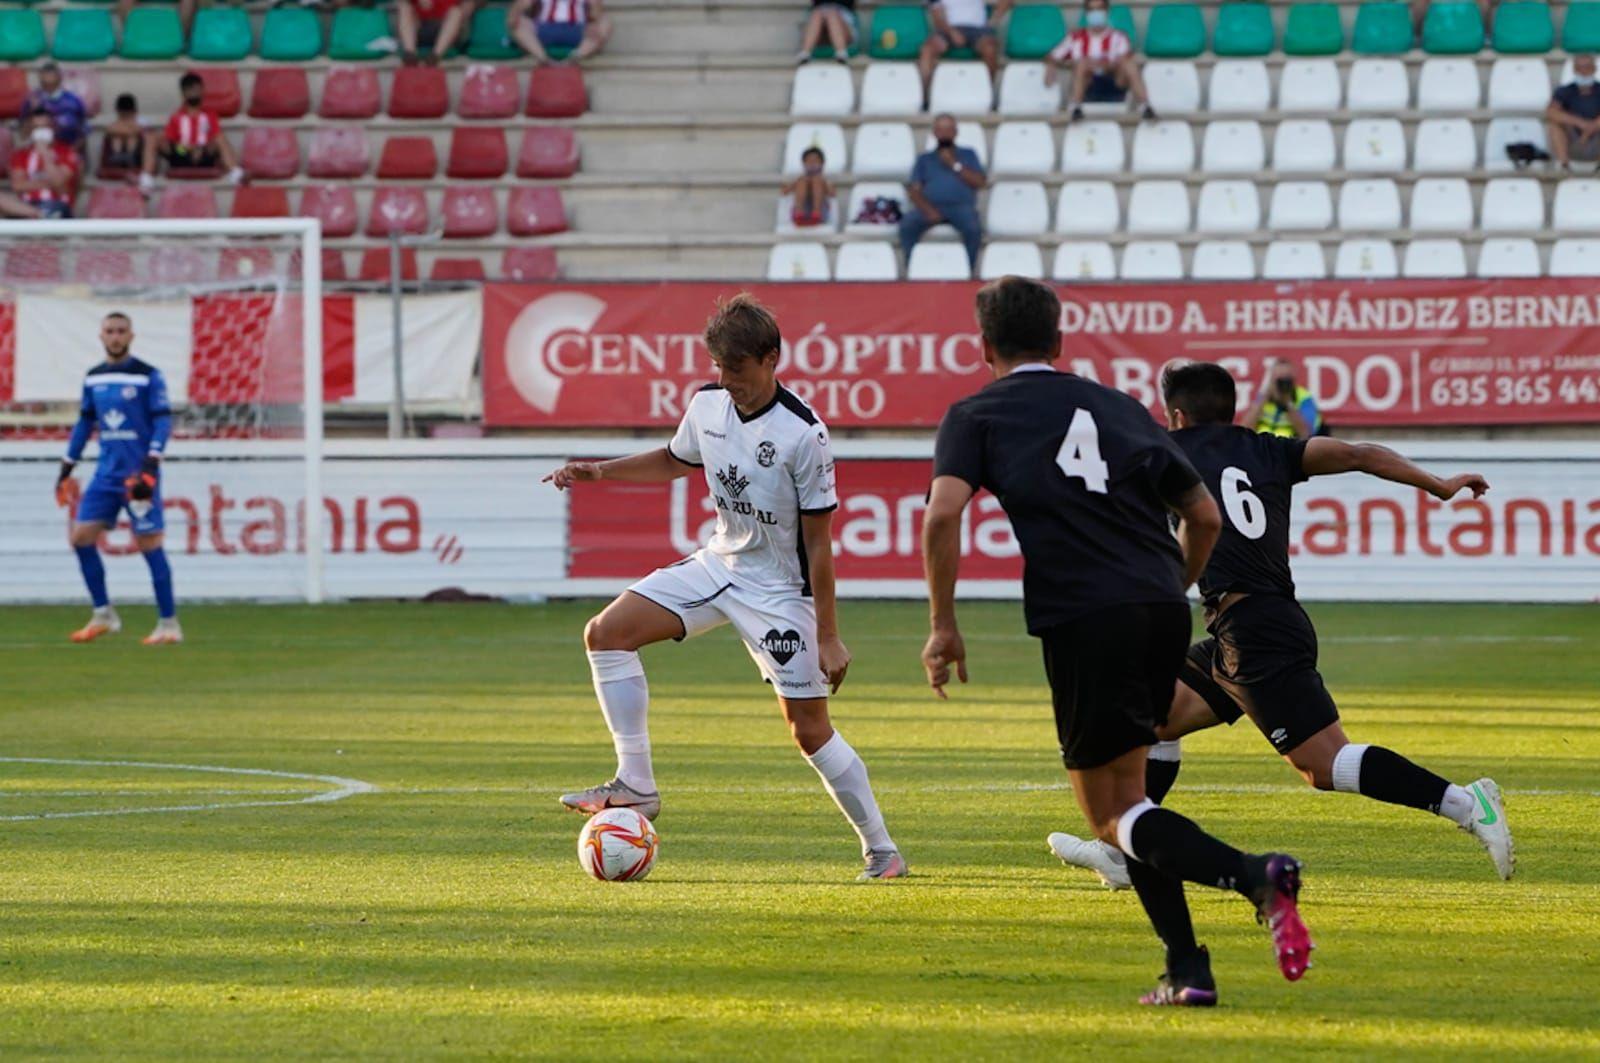 Zamora CF - Salamanca UDS: Derbi amistoso para medir fuerzas